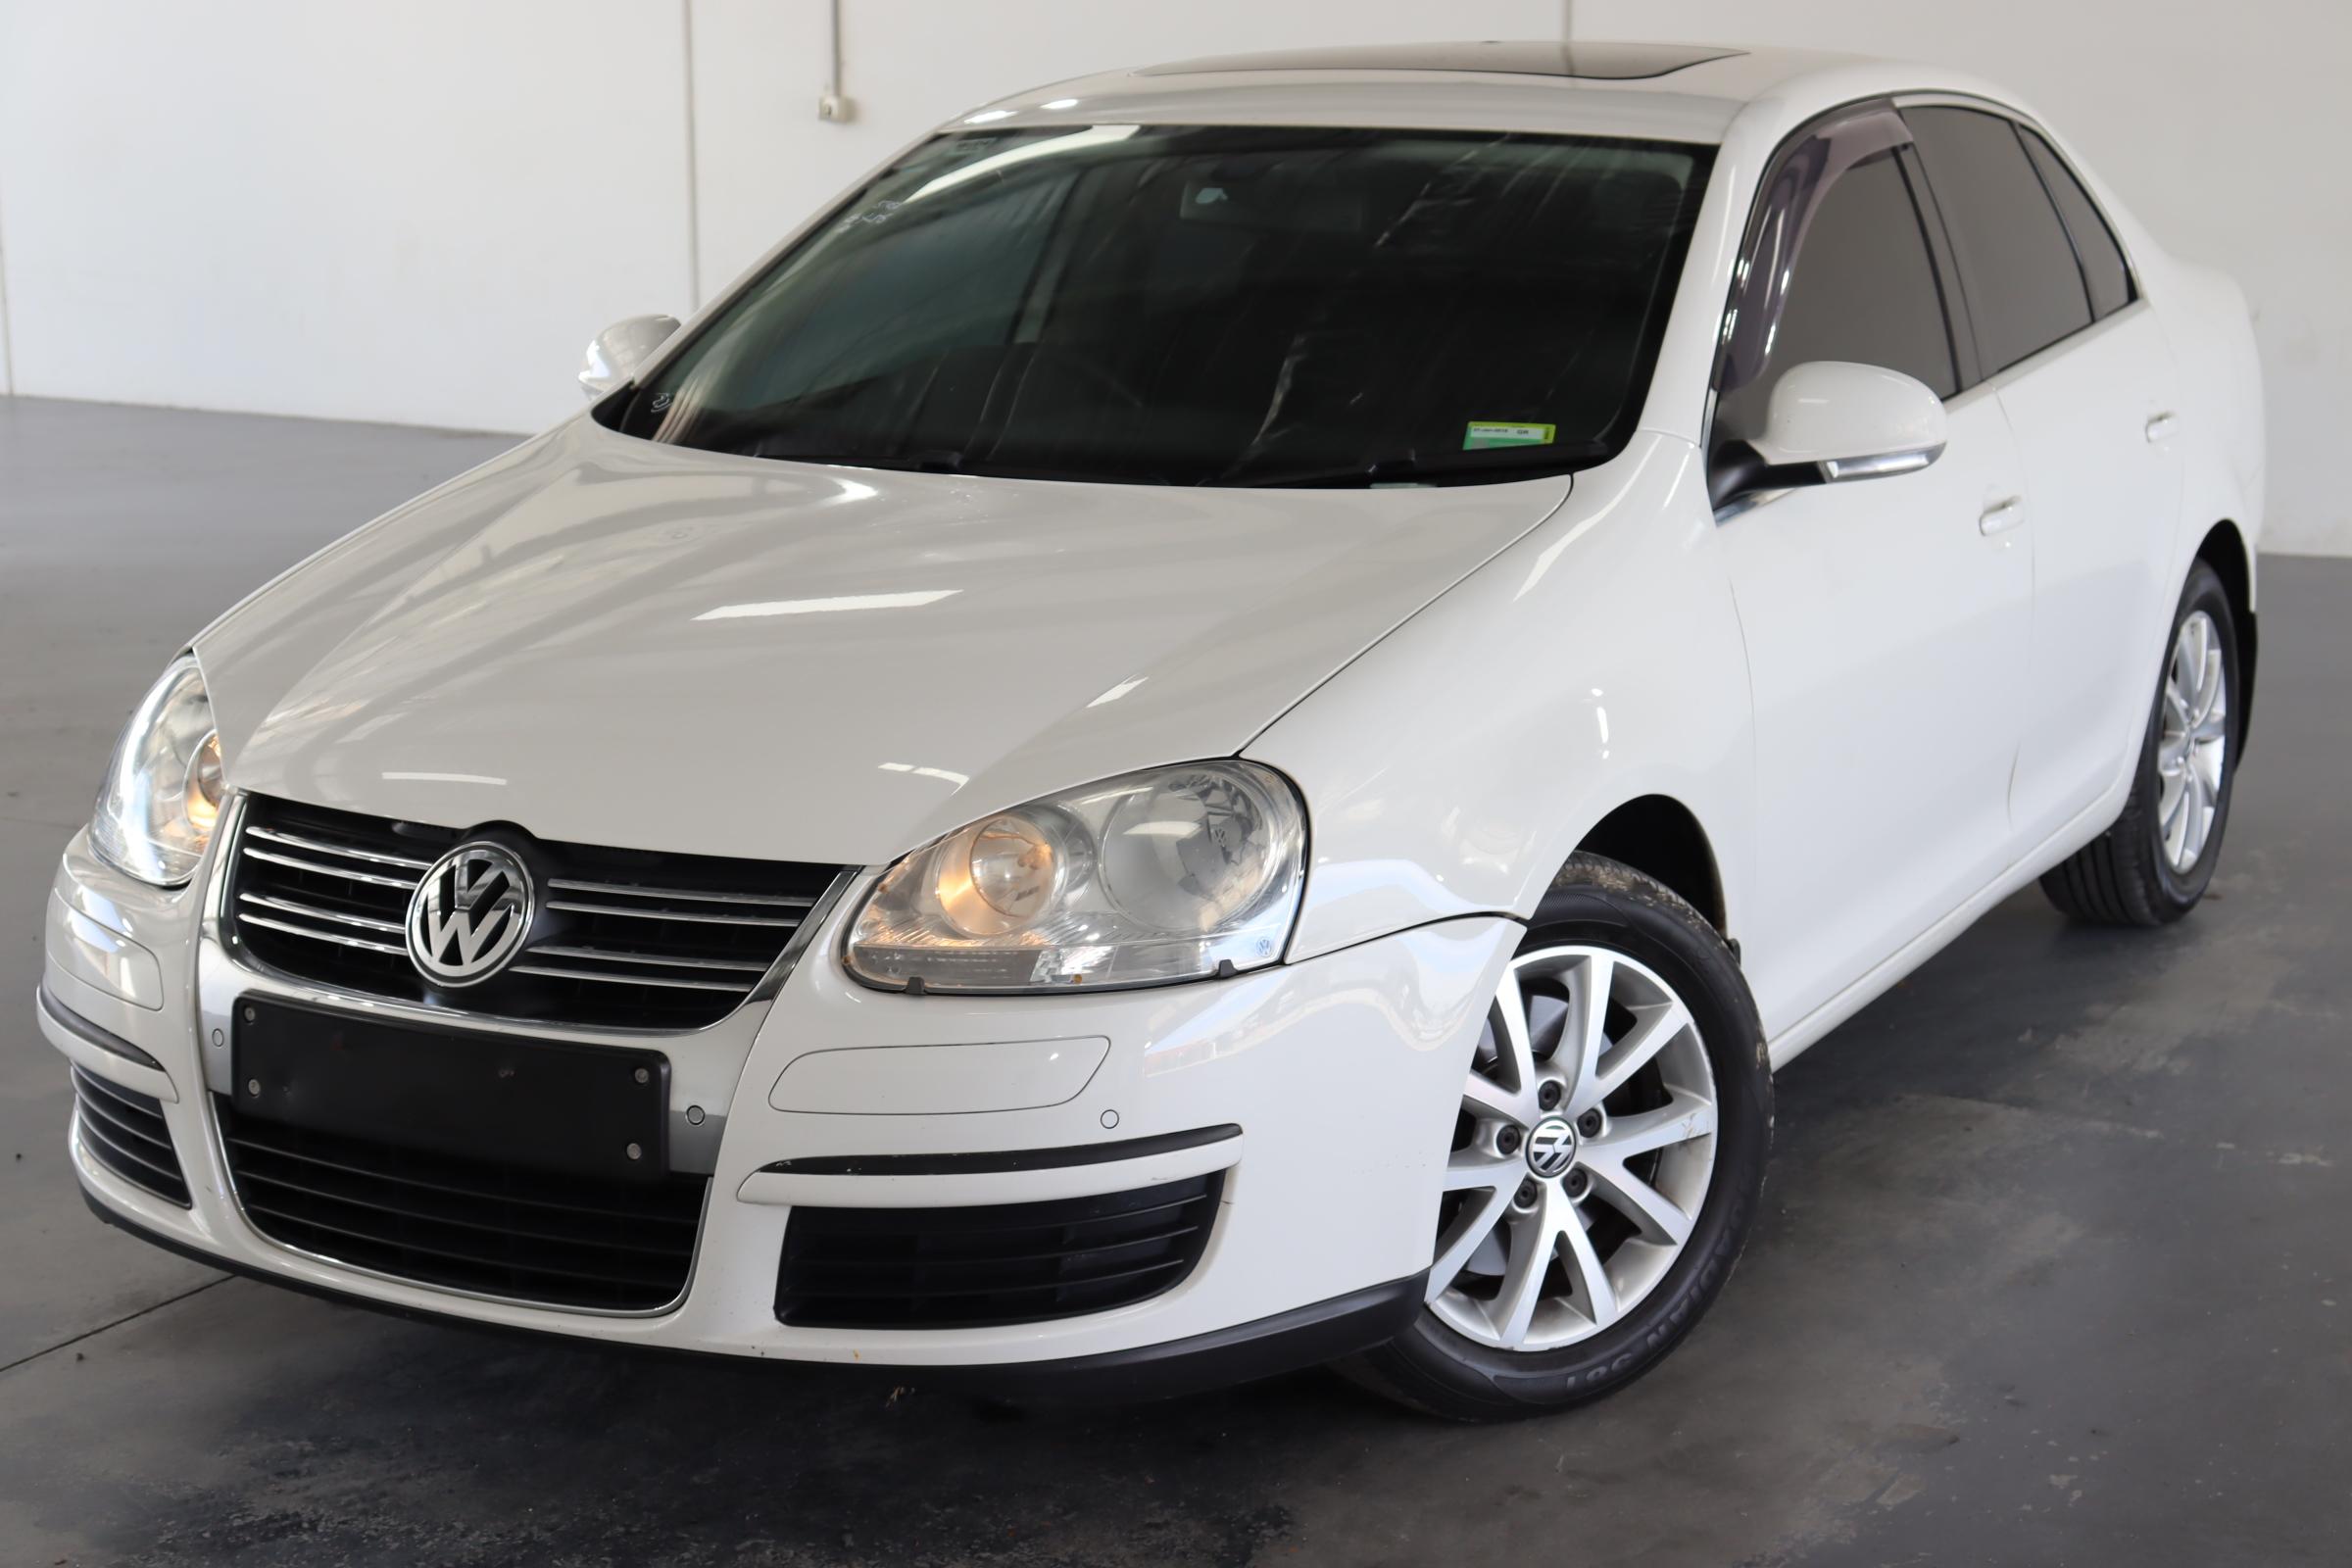 2011 Volkswagen Jetta 118TSI 1KM Automatic Sedan